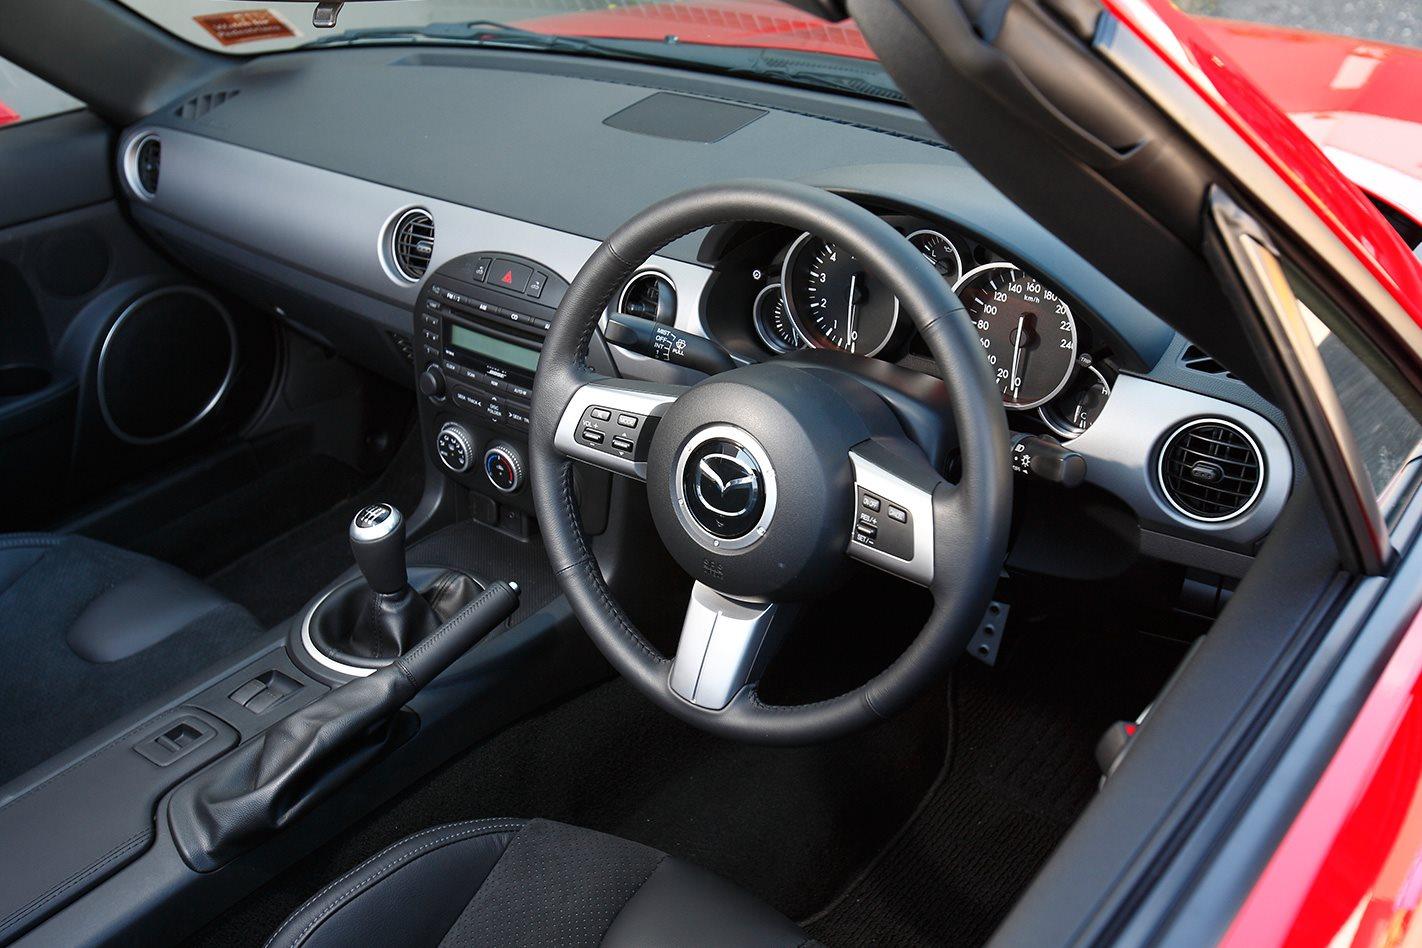 Mazda NC MX-5 interior